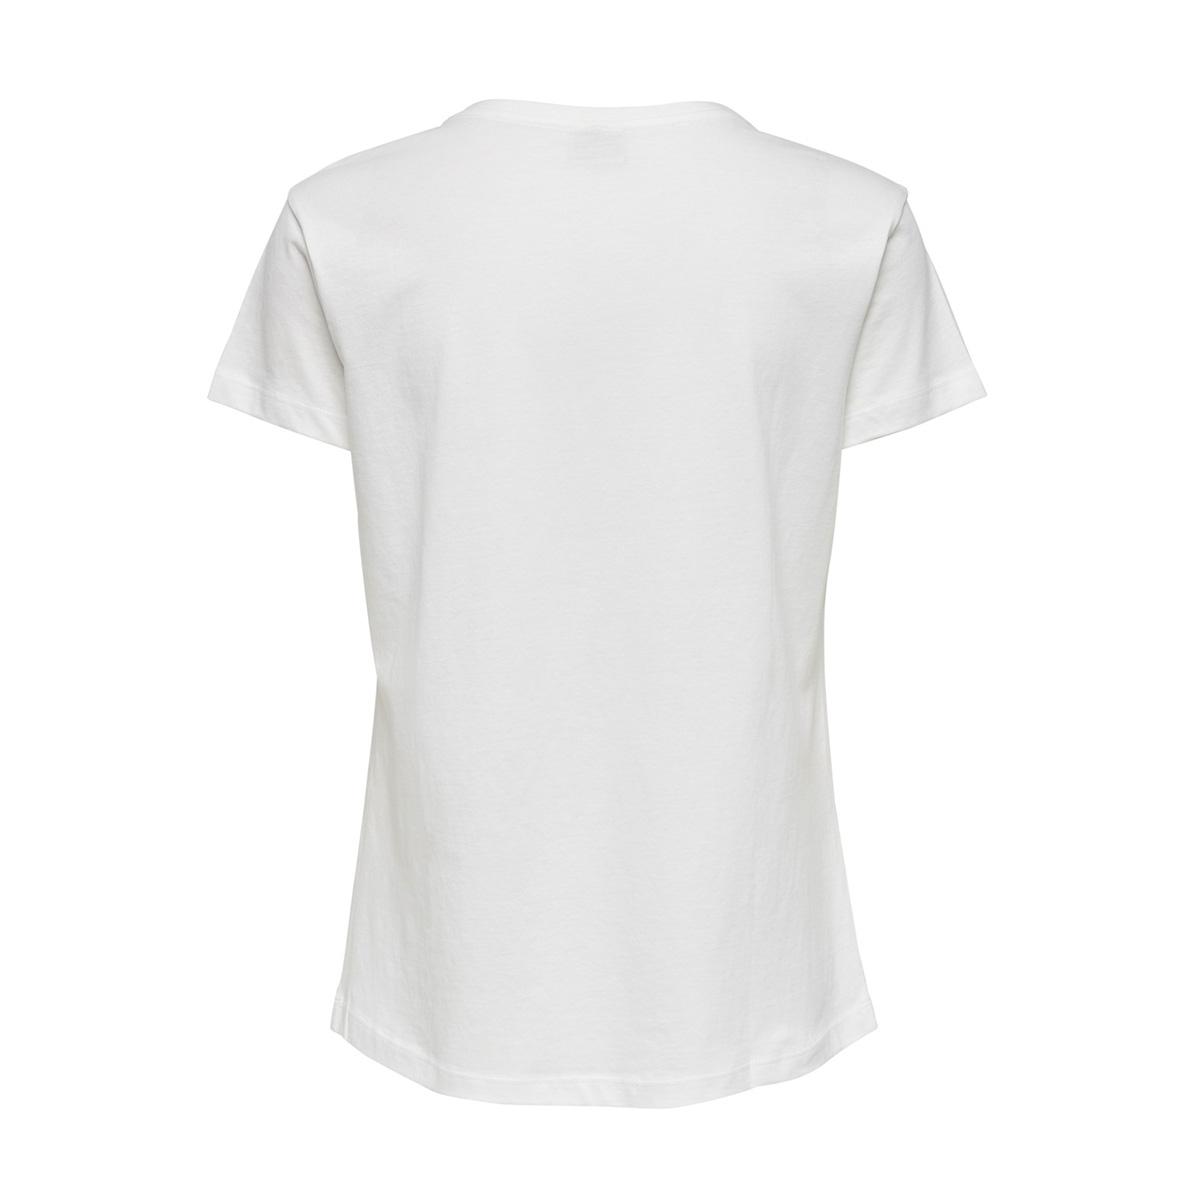 jdytibina s/s print top jrs exp 15188816 jacqueline de yong t-shirt cloud dancer/deep lake